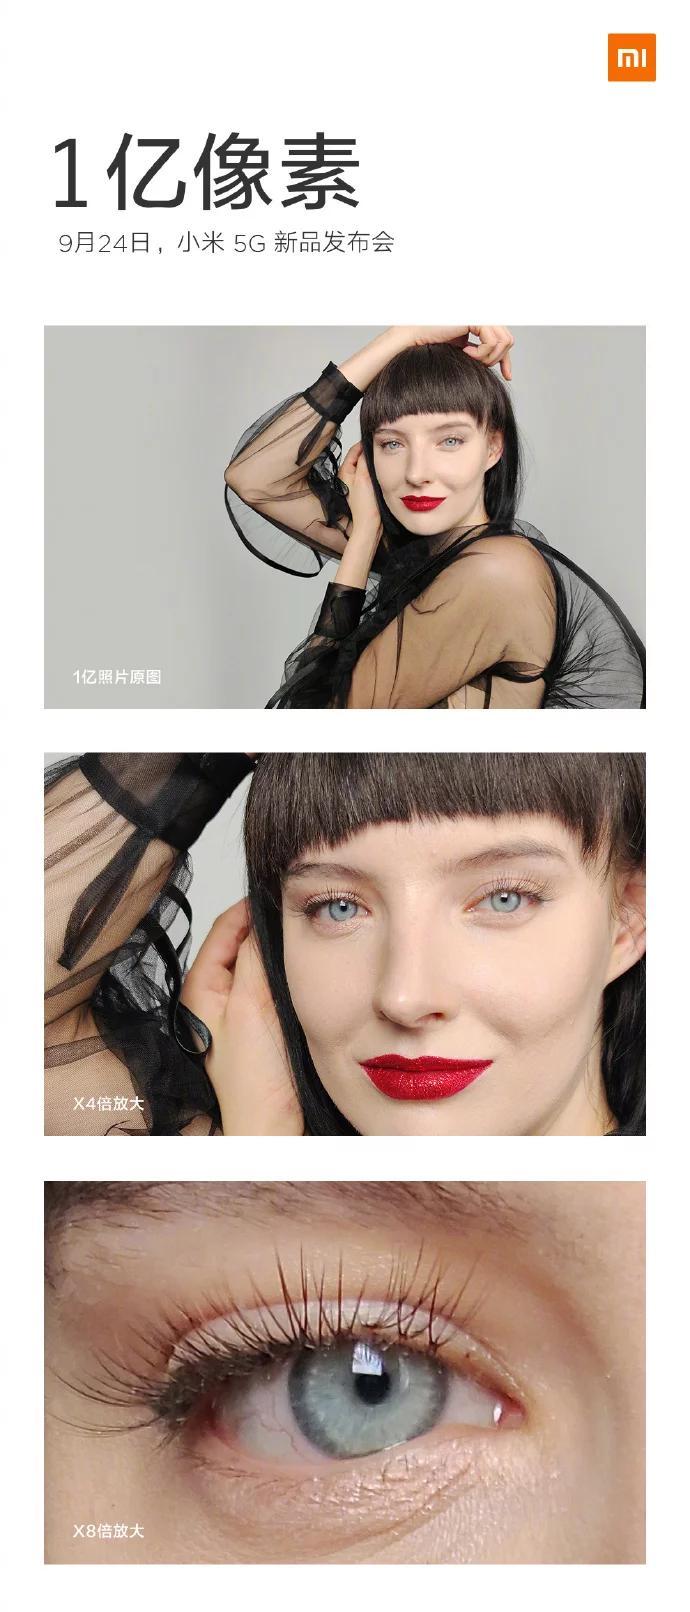 Xiaomi Mi MIX Alpha - Muestra fotográfica